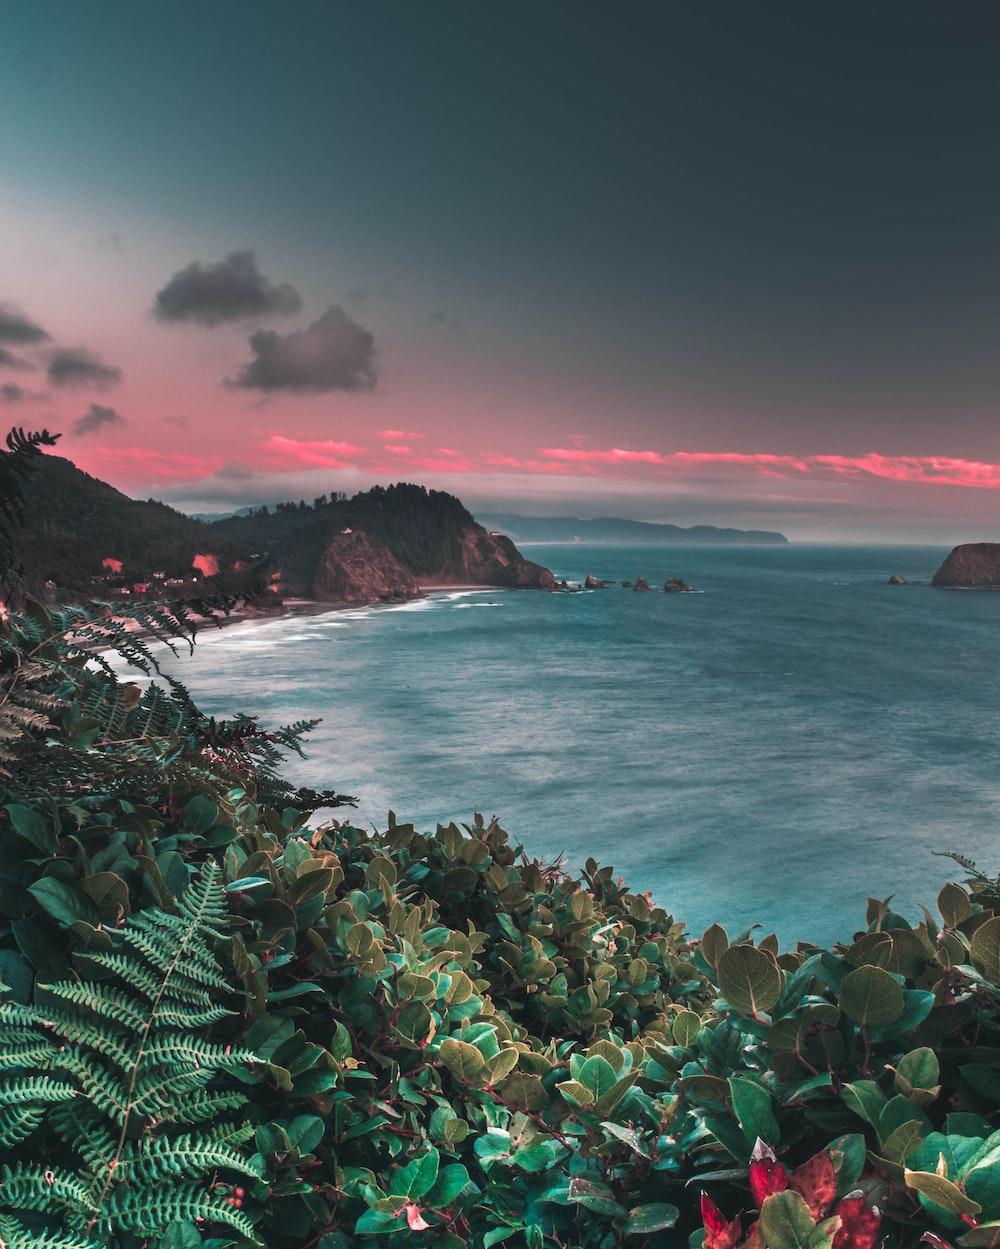 sea beside sleeping dinosaur island during golden hour